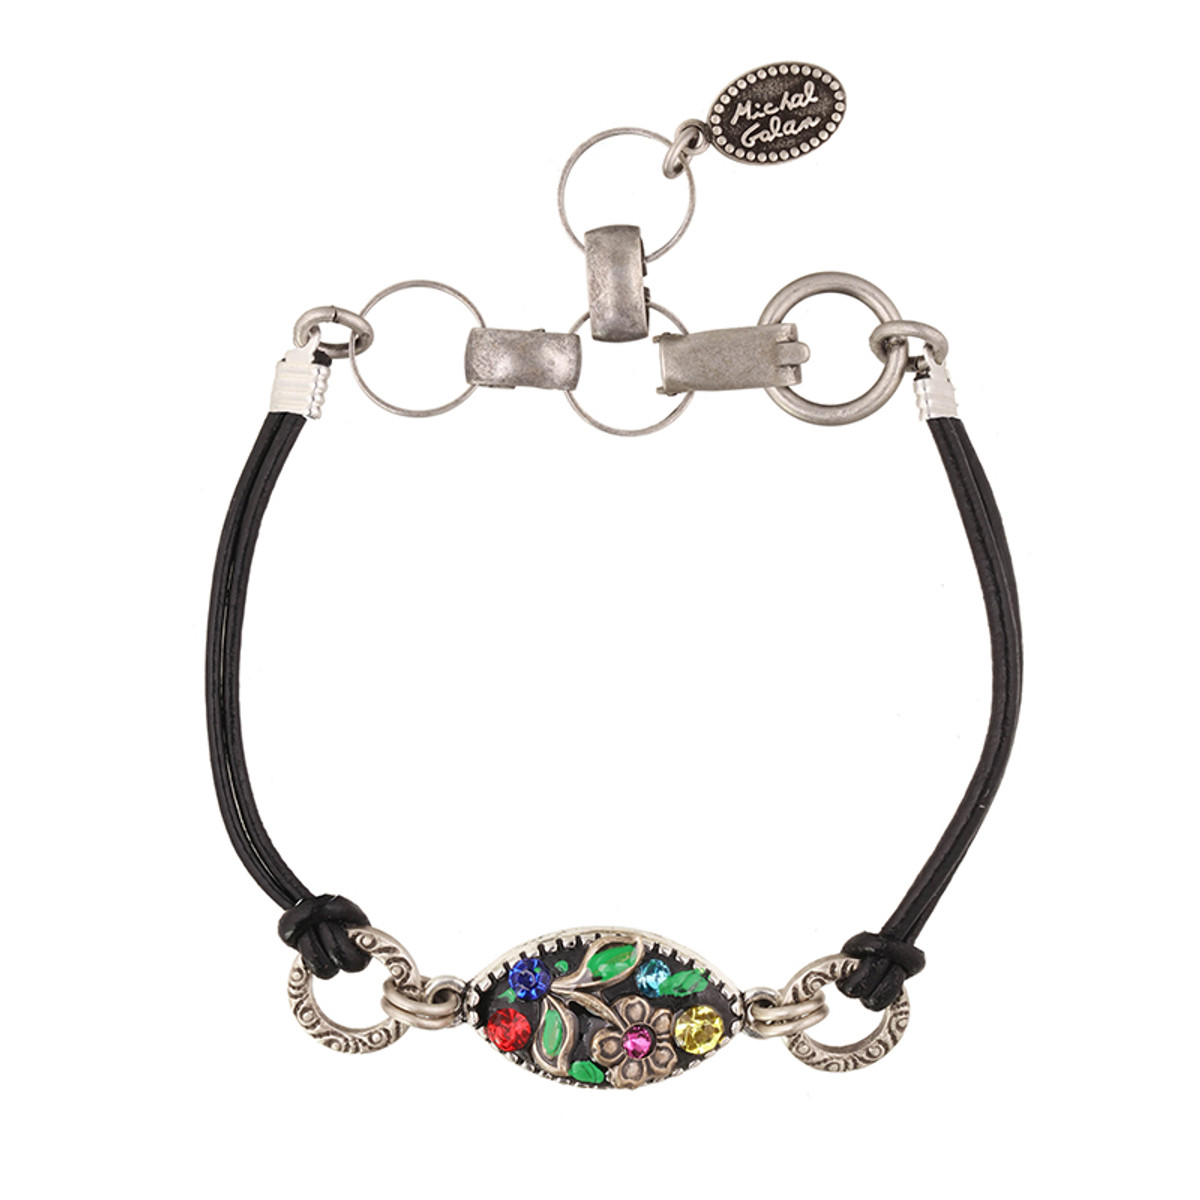 Michal Golan Midsummer Small Oval Bracelet